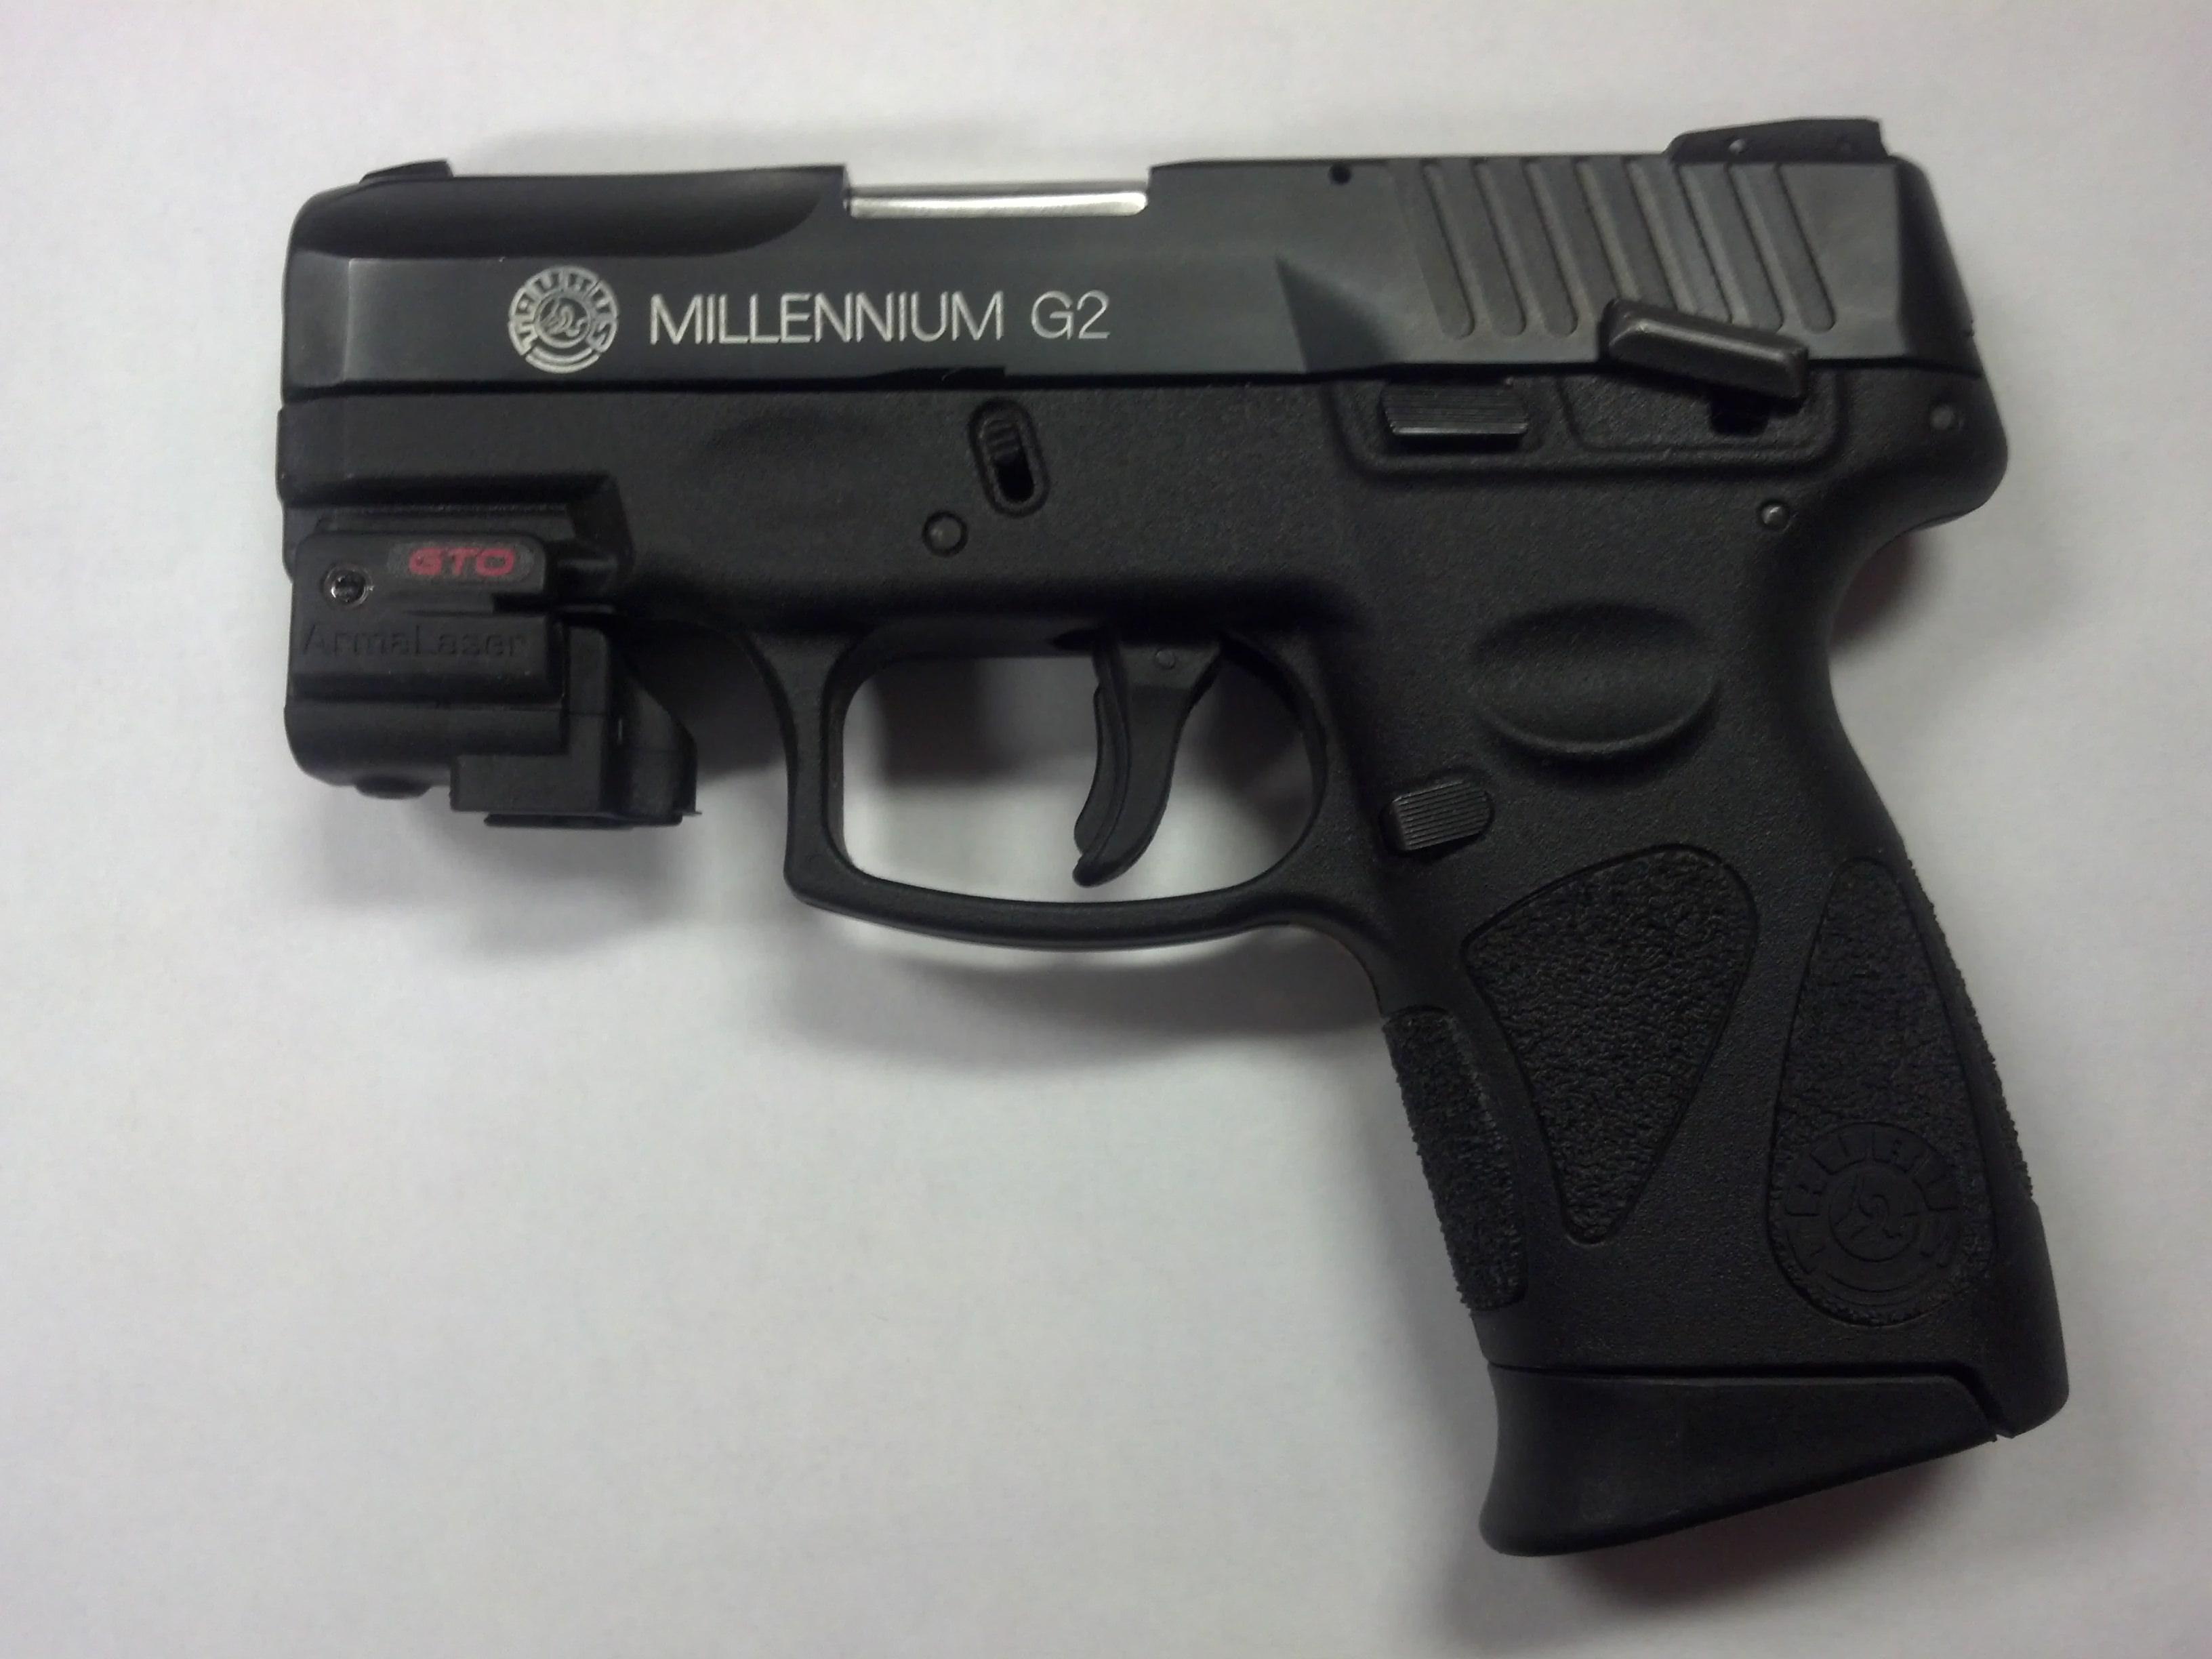 709 slim 9mm pistol - Name Img_20140805_112921_783 Jpg Views 880 Size 624 4 Kb